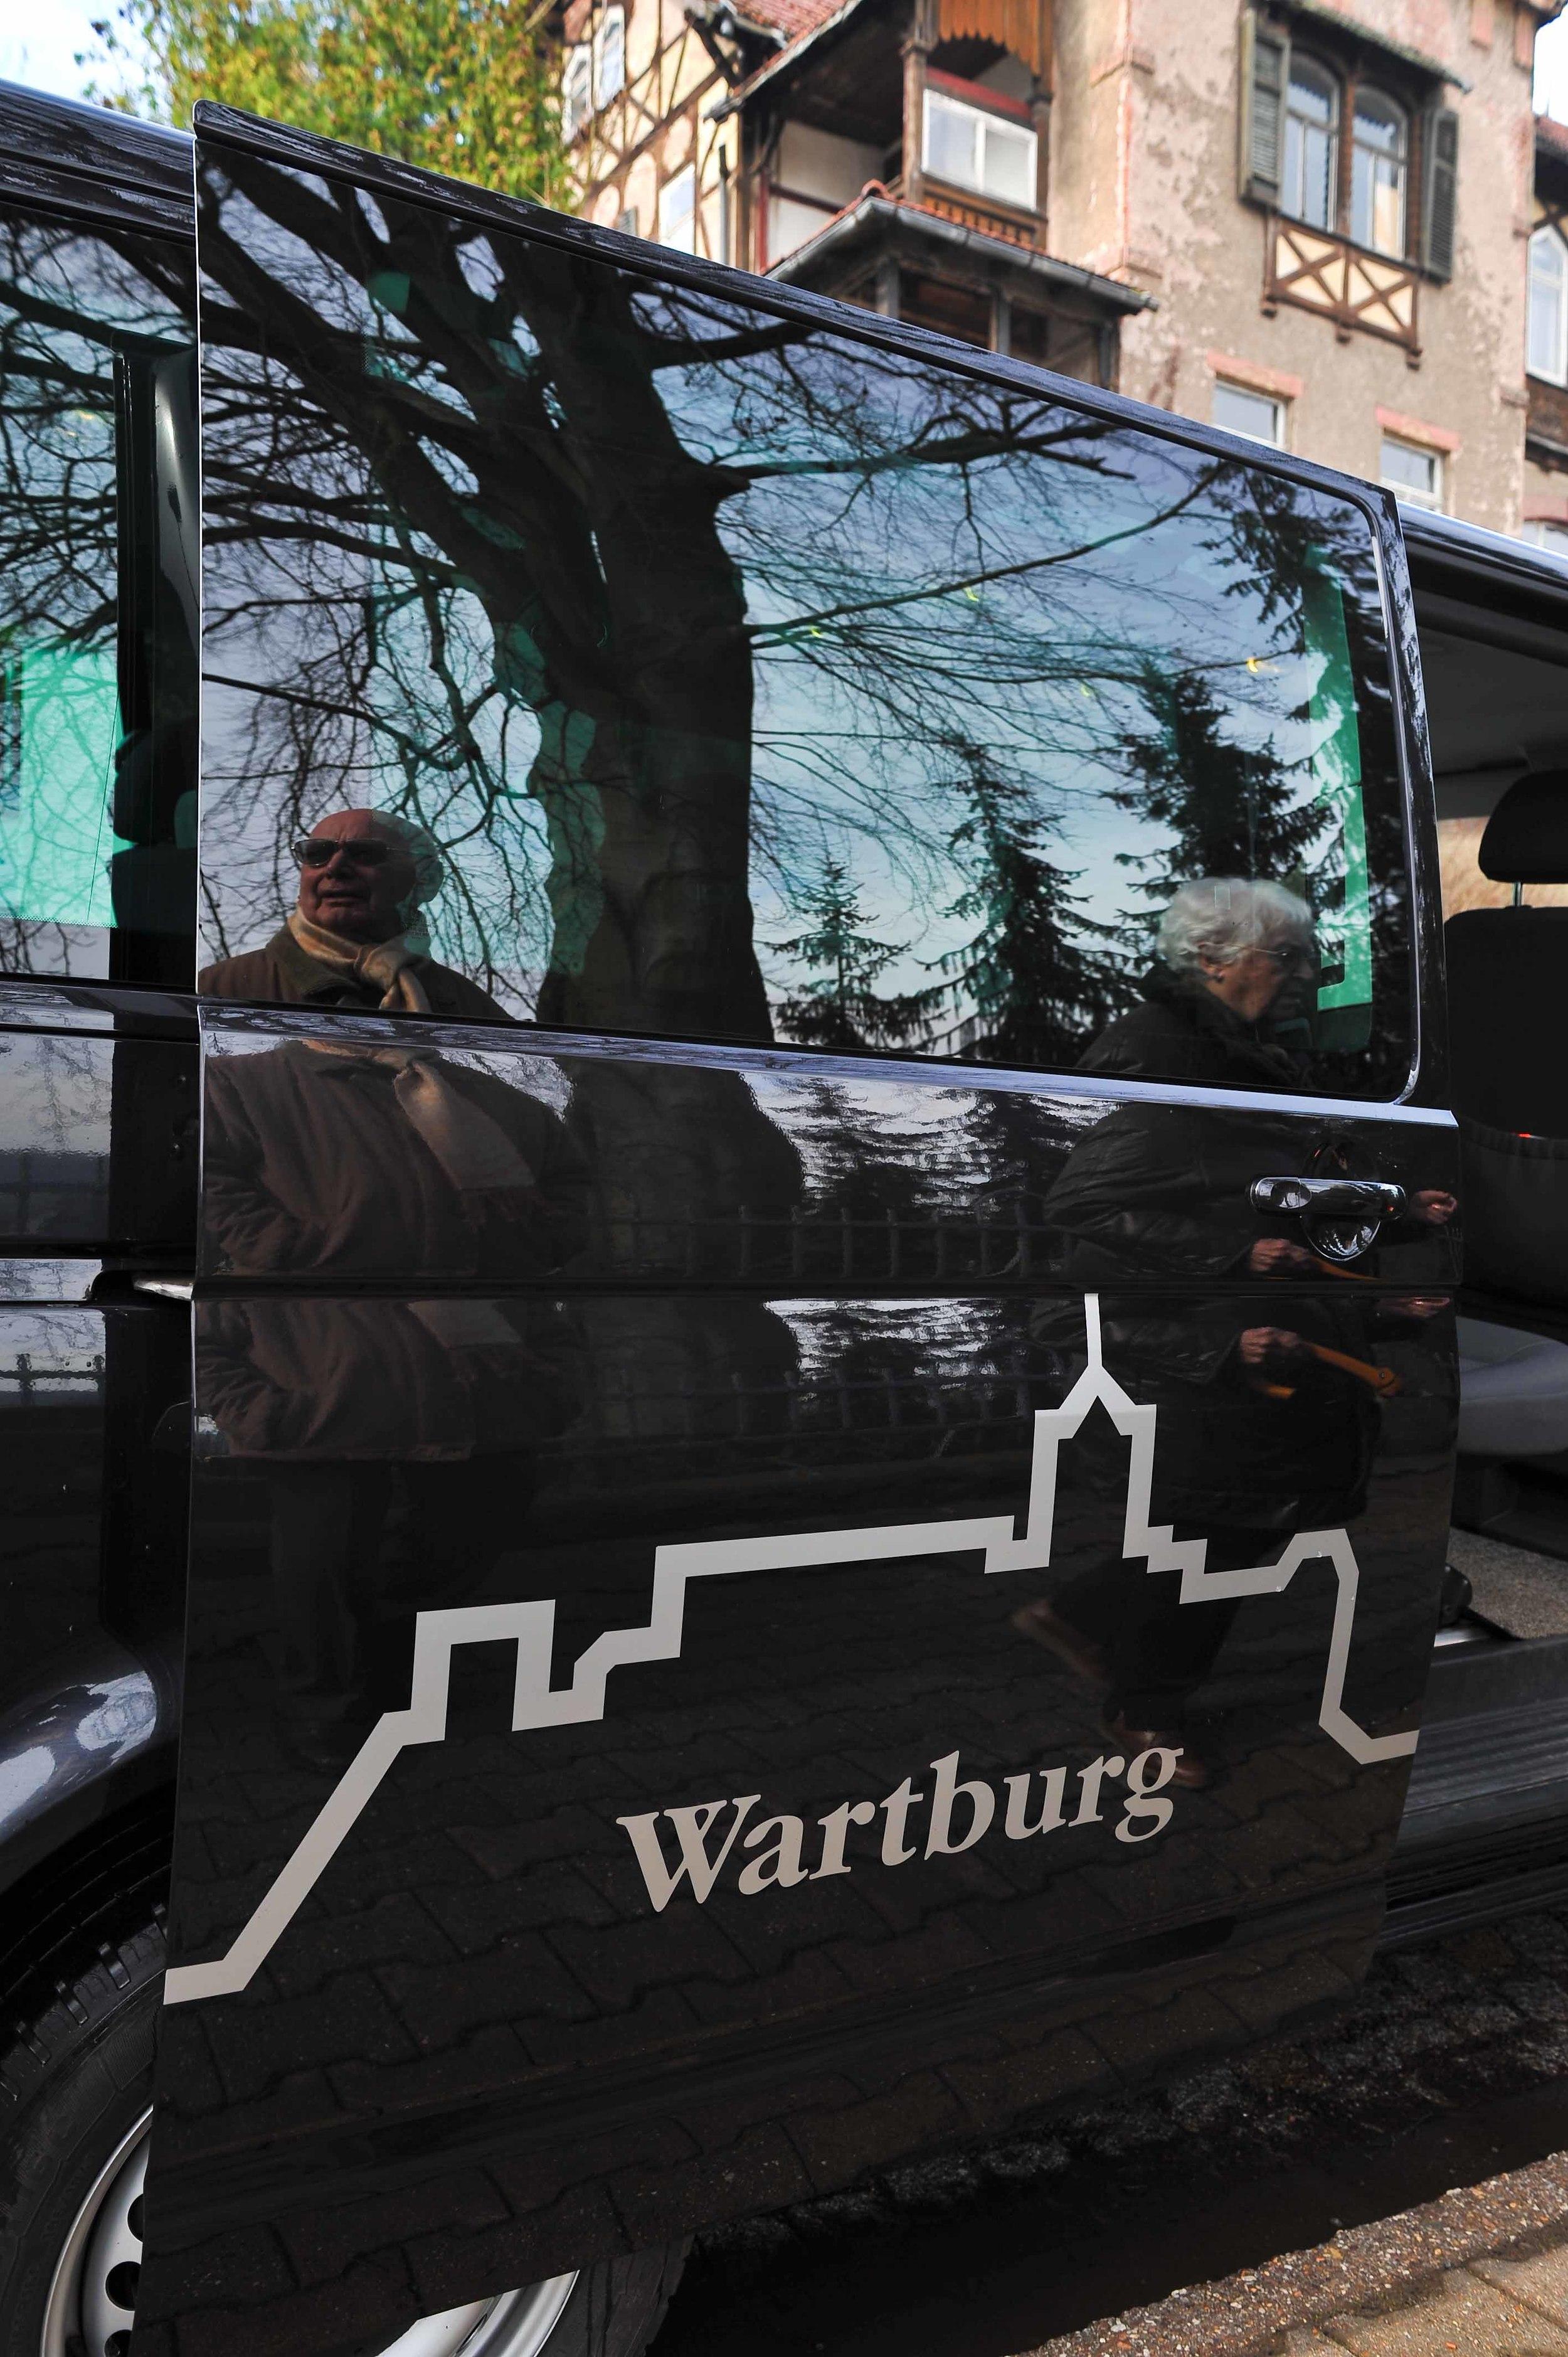 geburtstag_wartburg14.jpg